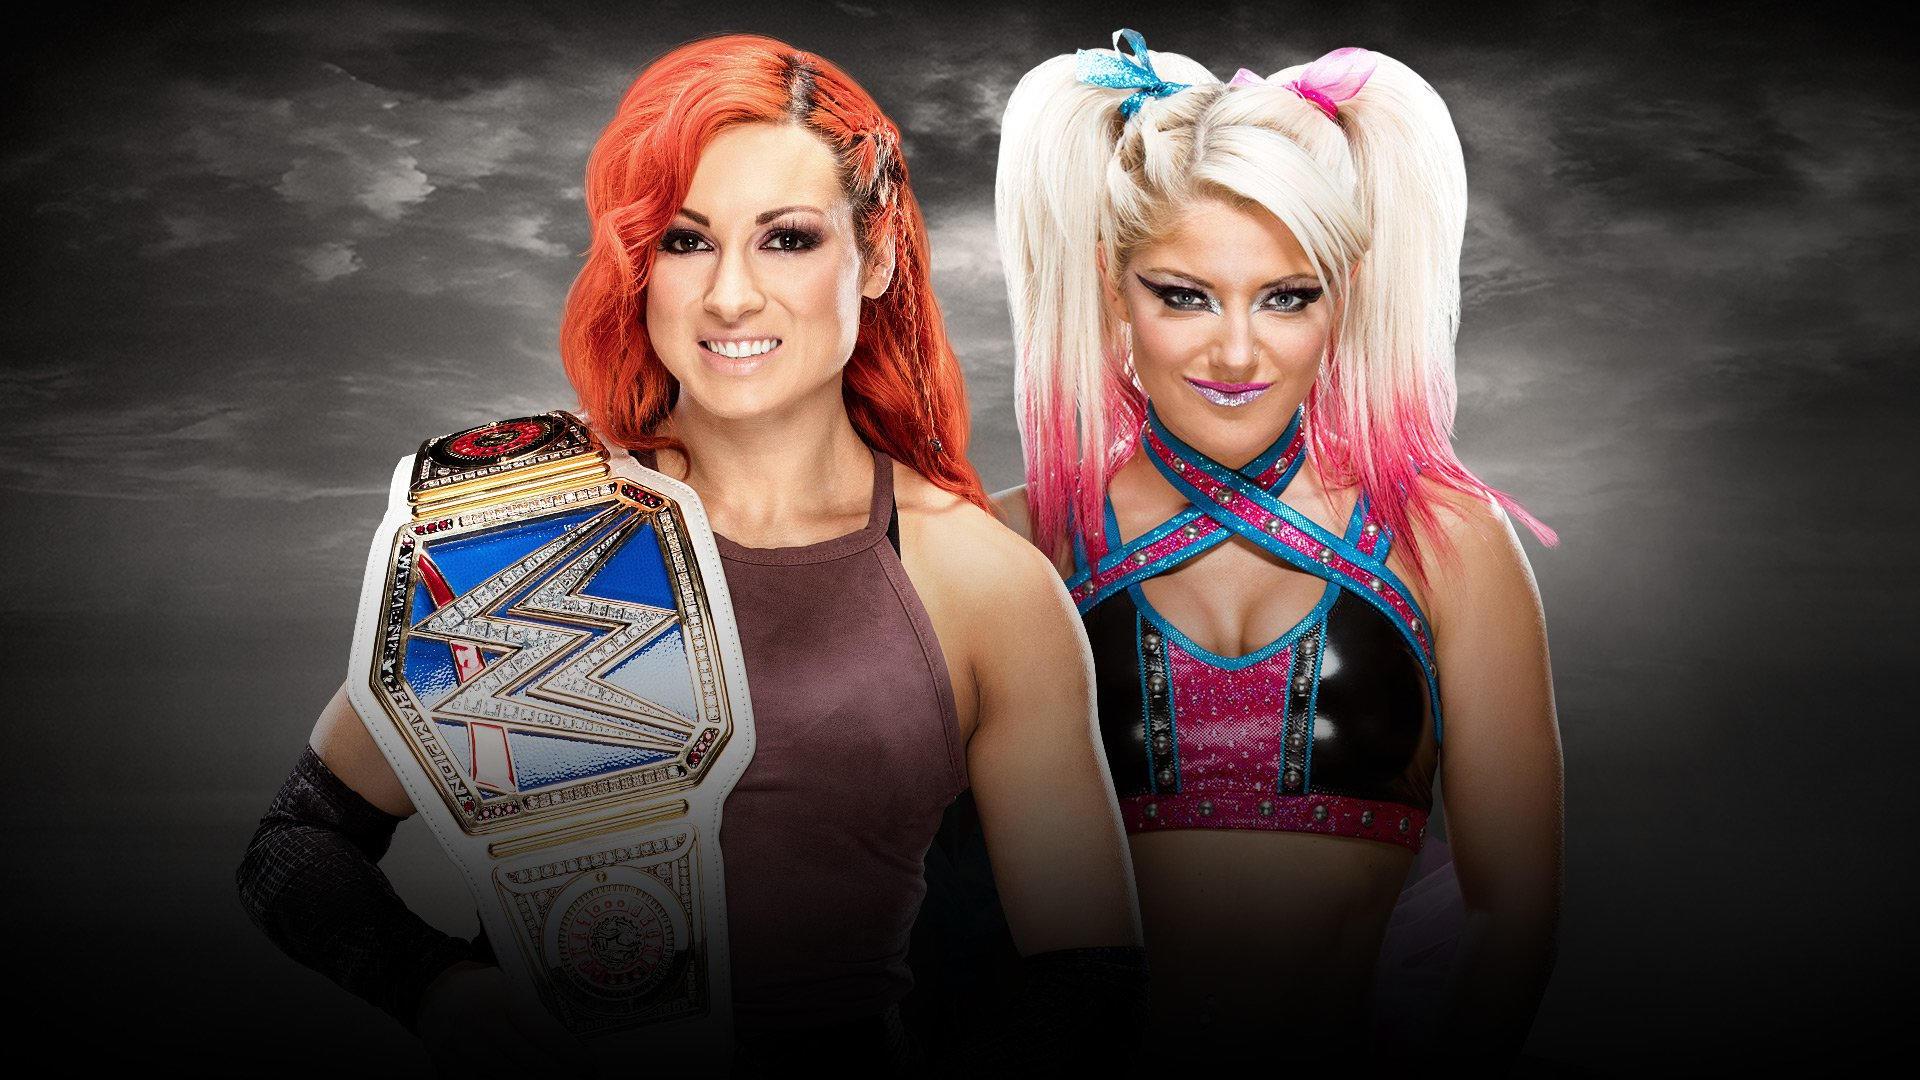 WWE NO MERCY - OCTOBER 9 - SACRAMENTO, CALIFORNIA 20160923_Nomercy_LynchBliss--6068d143b053e93e1be77ec361d696d4